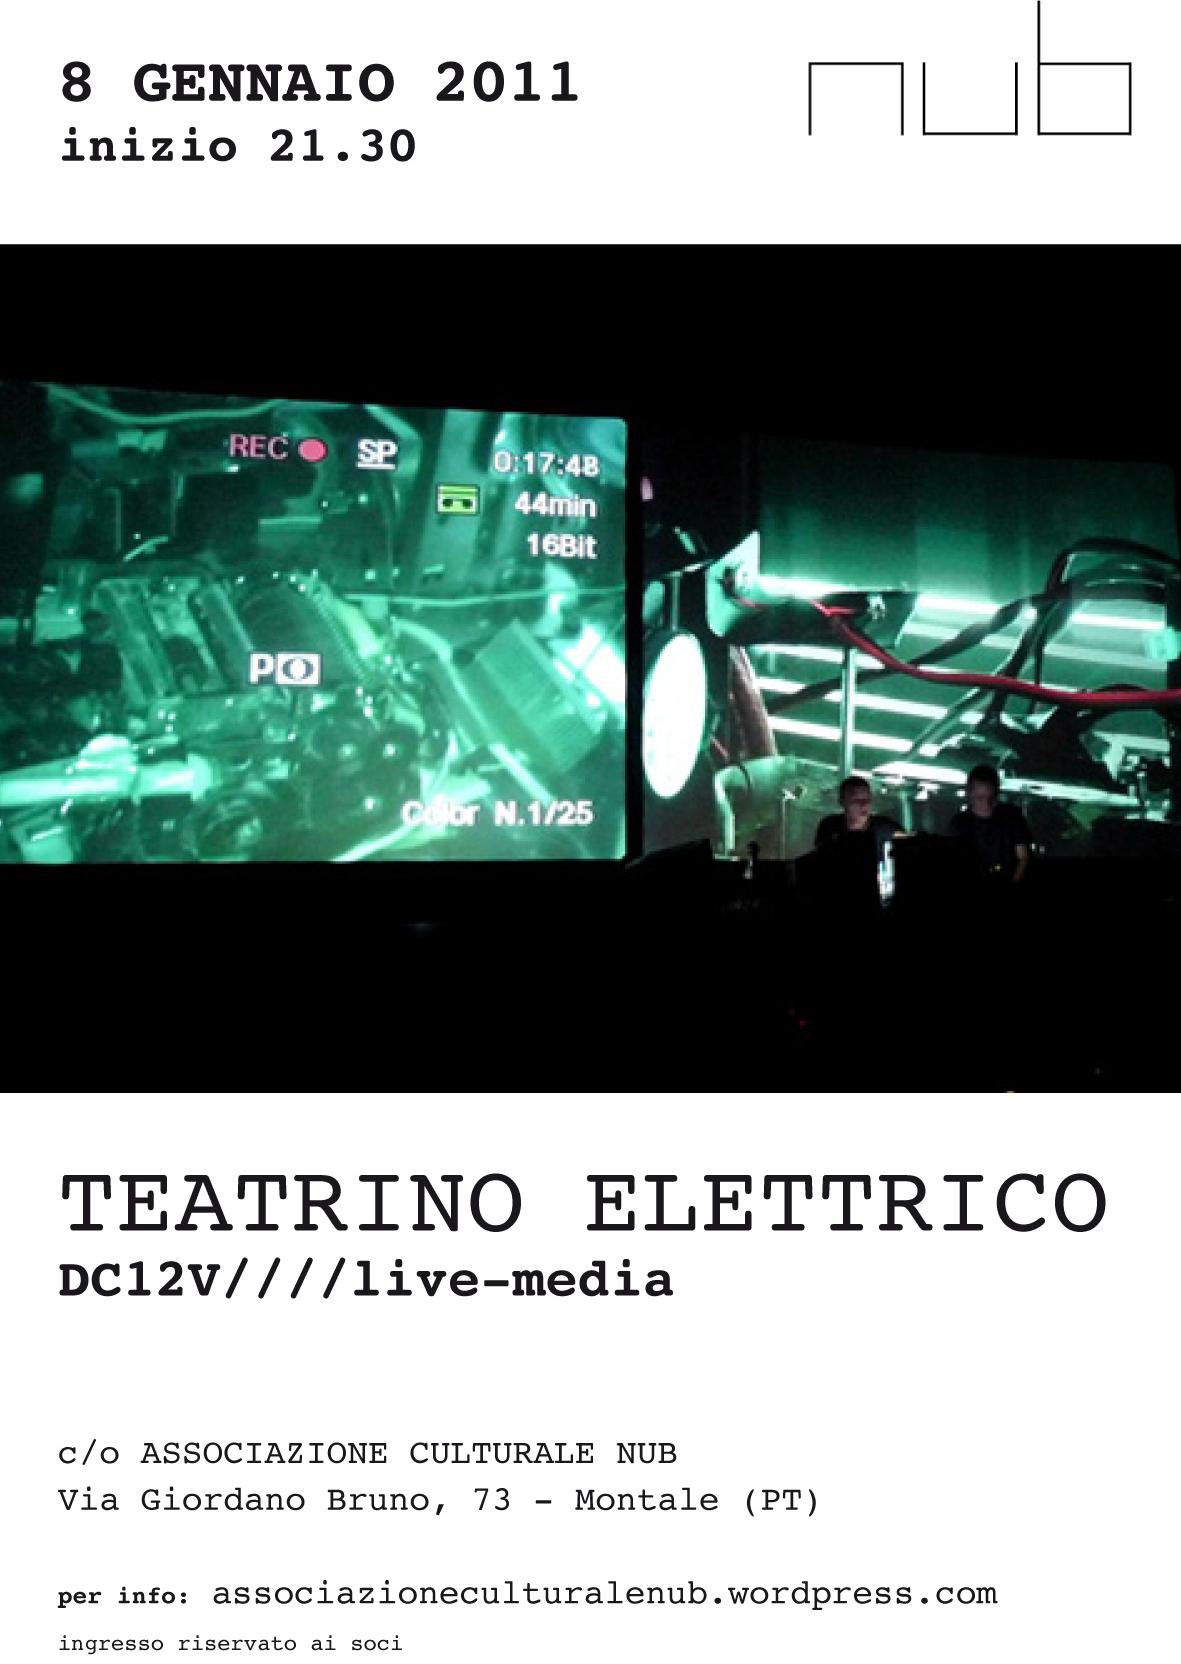 TEATRINO ELETTRICO | 08.01.2011